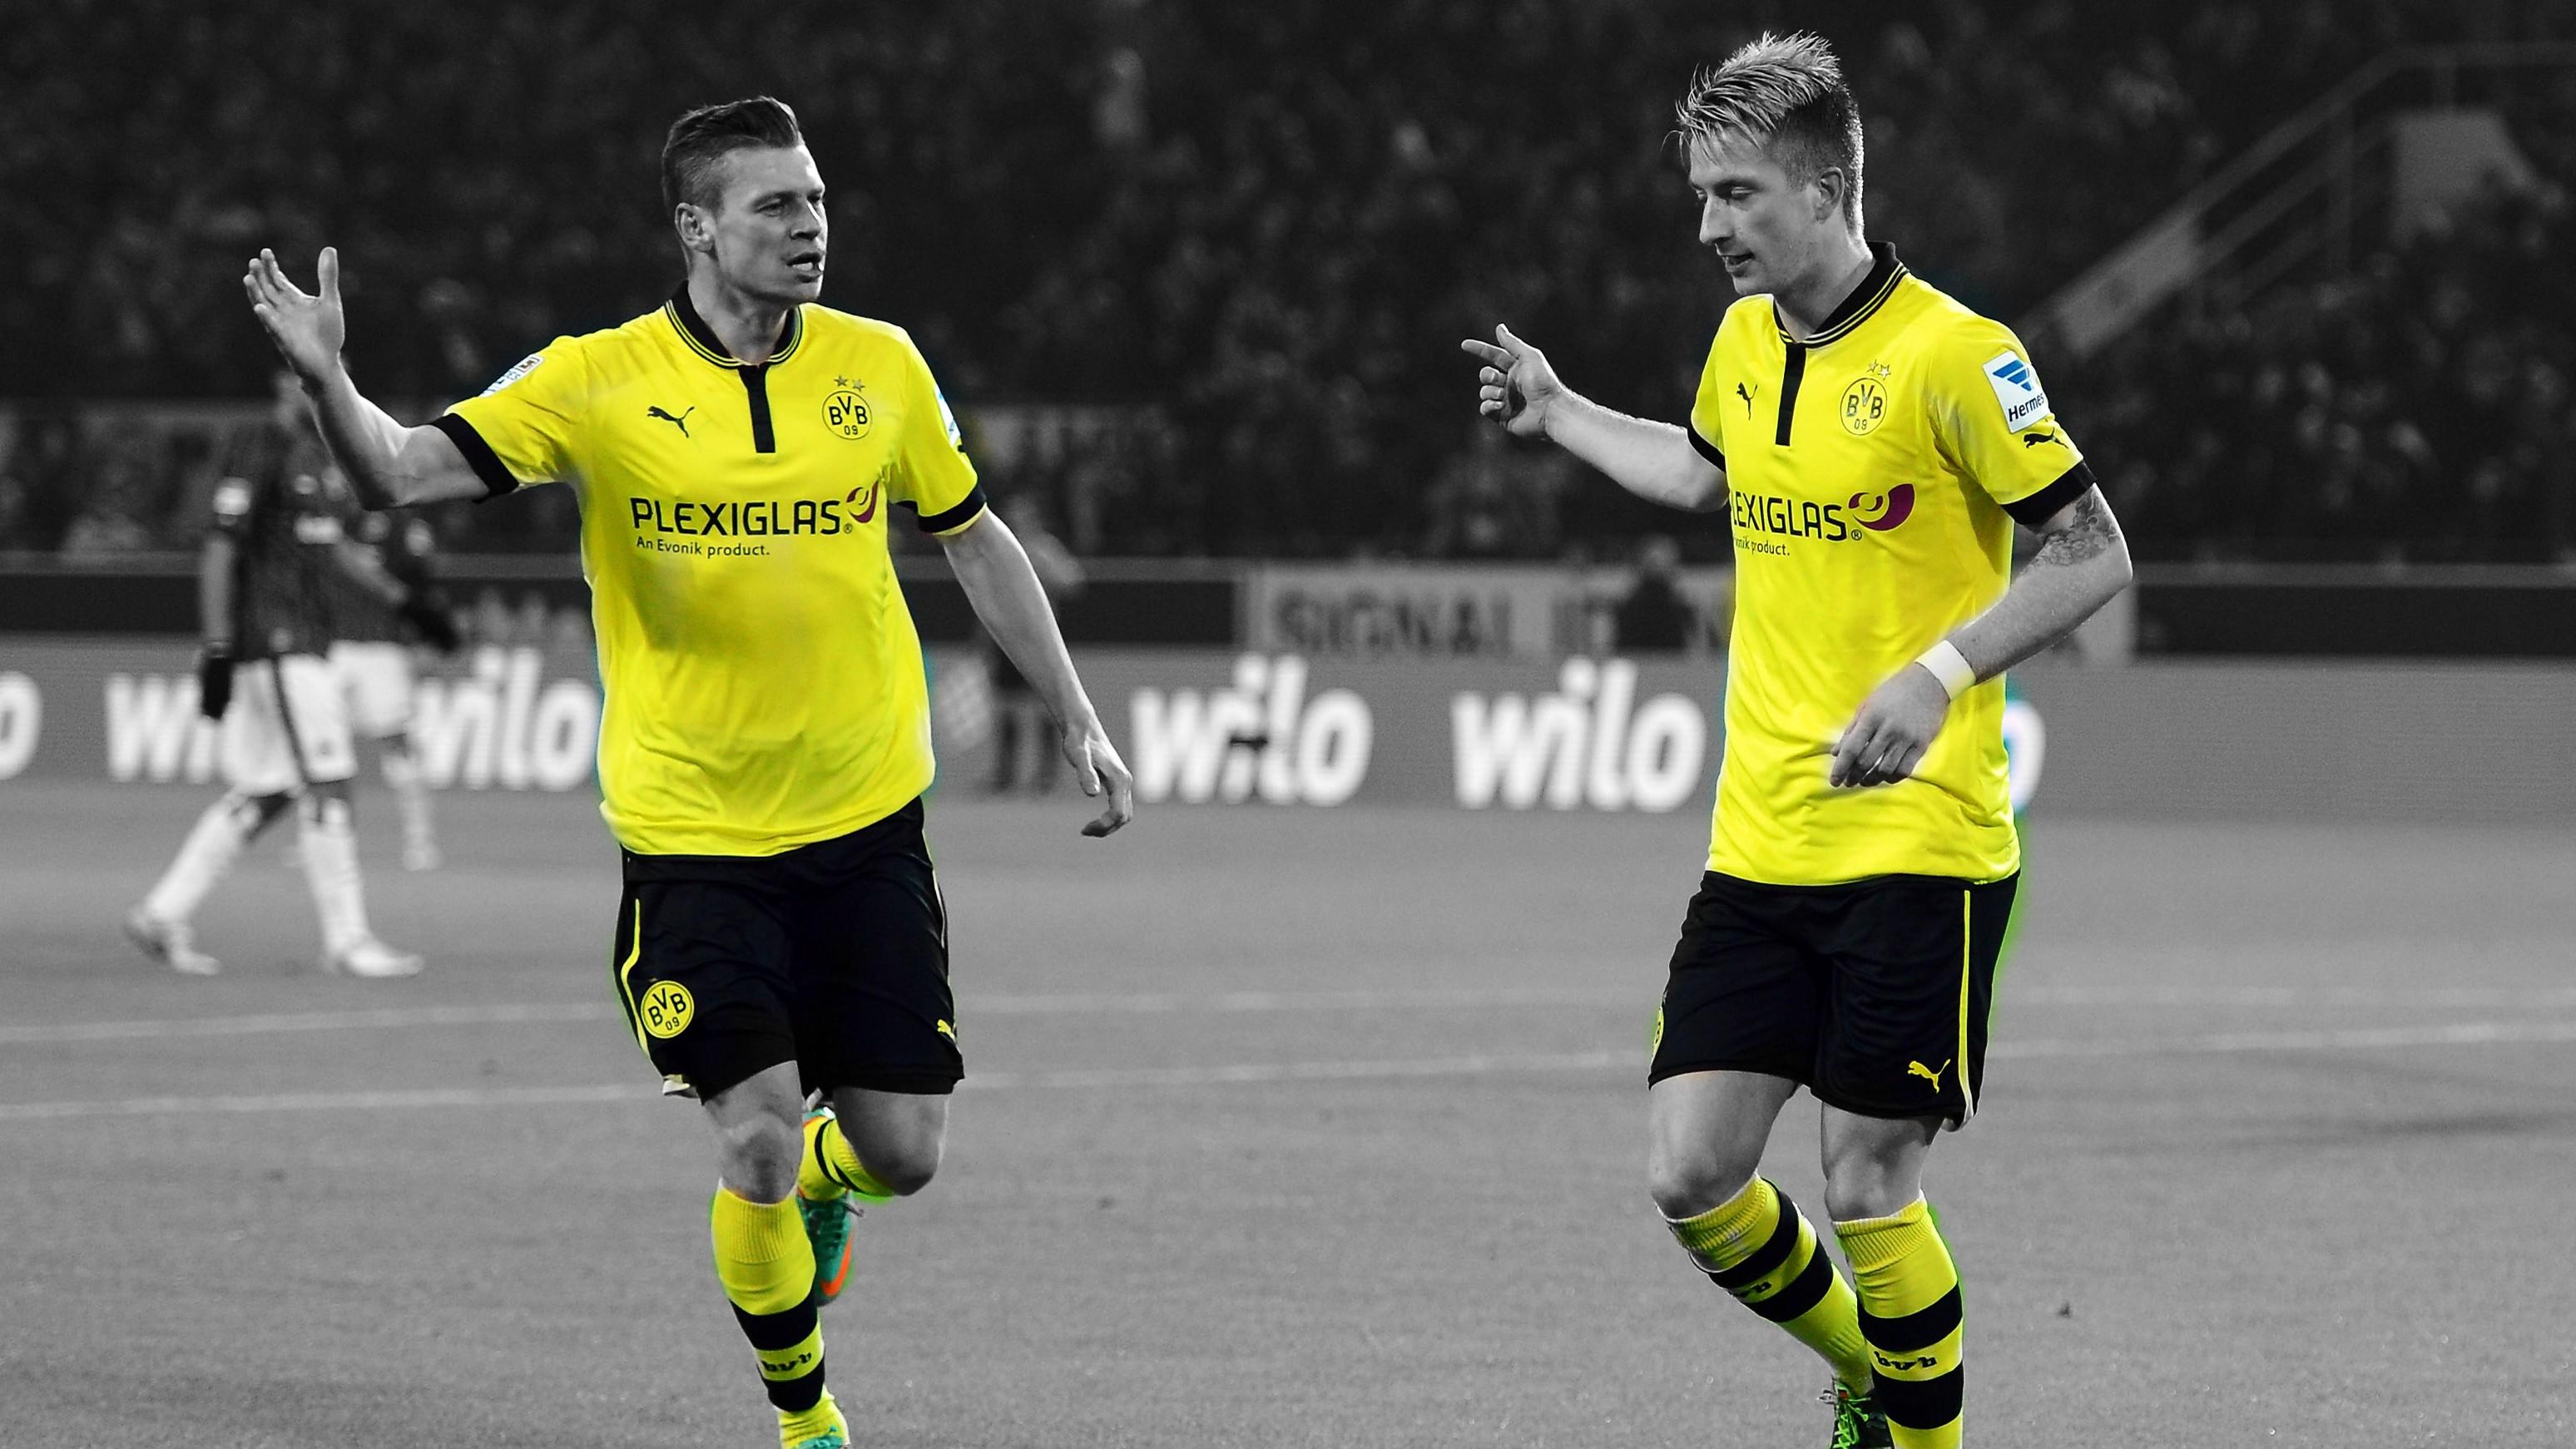 Hintergrundbilder : Sport, Selektive Färbung, Gelb, Mannschaft ...